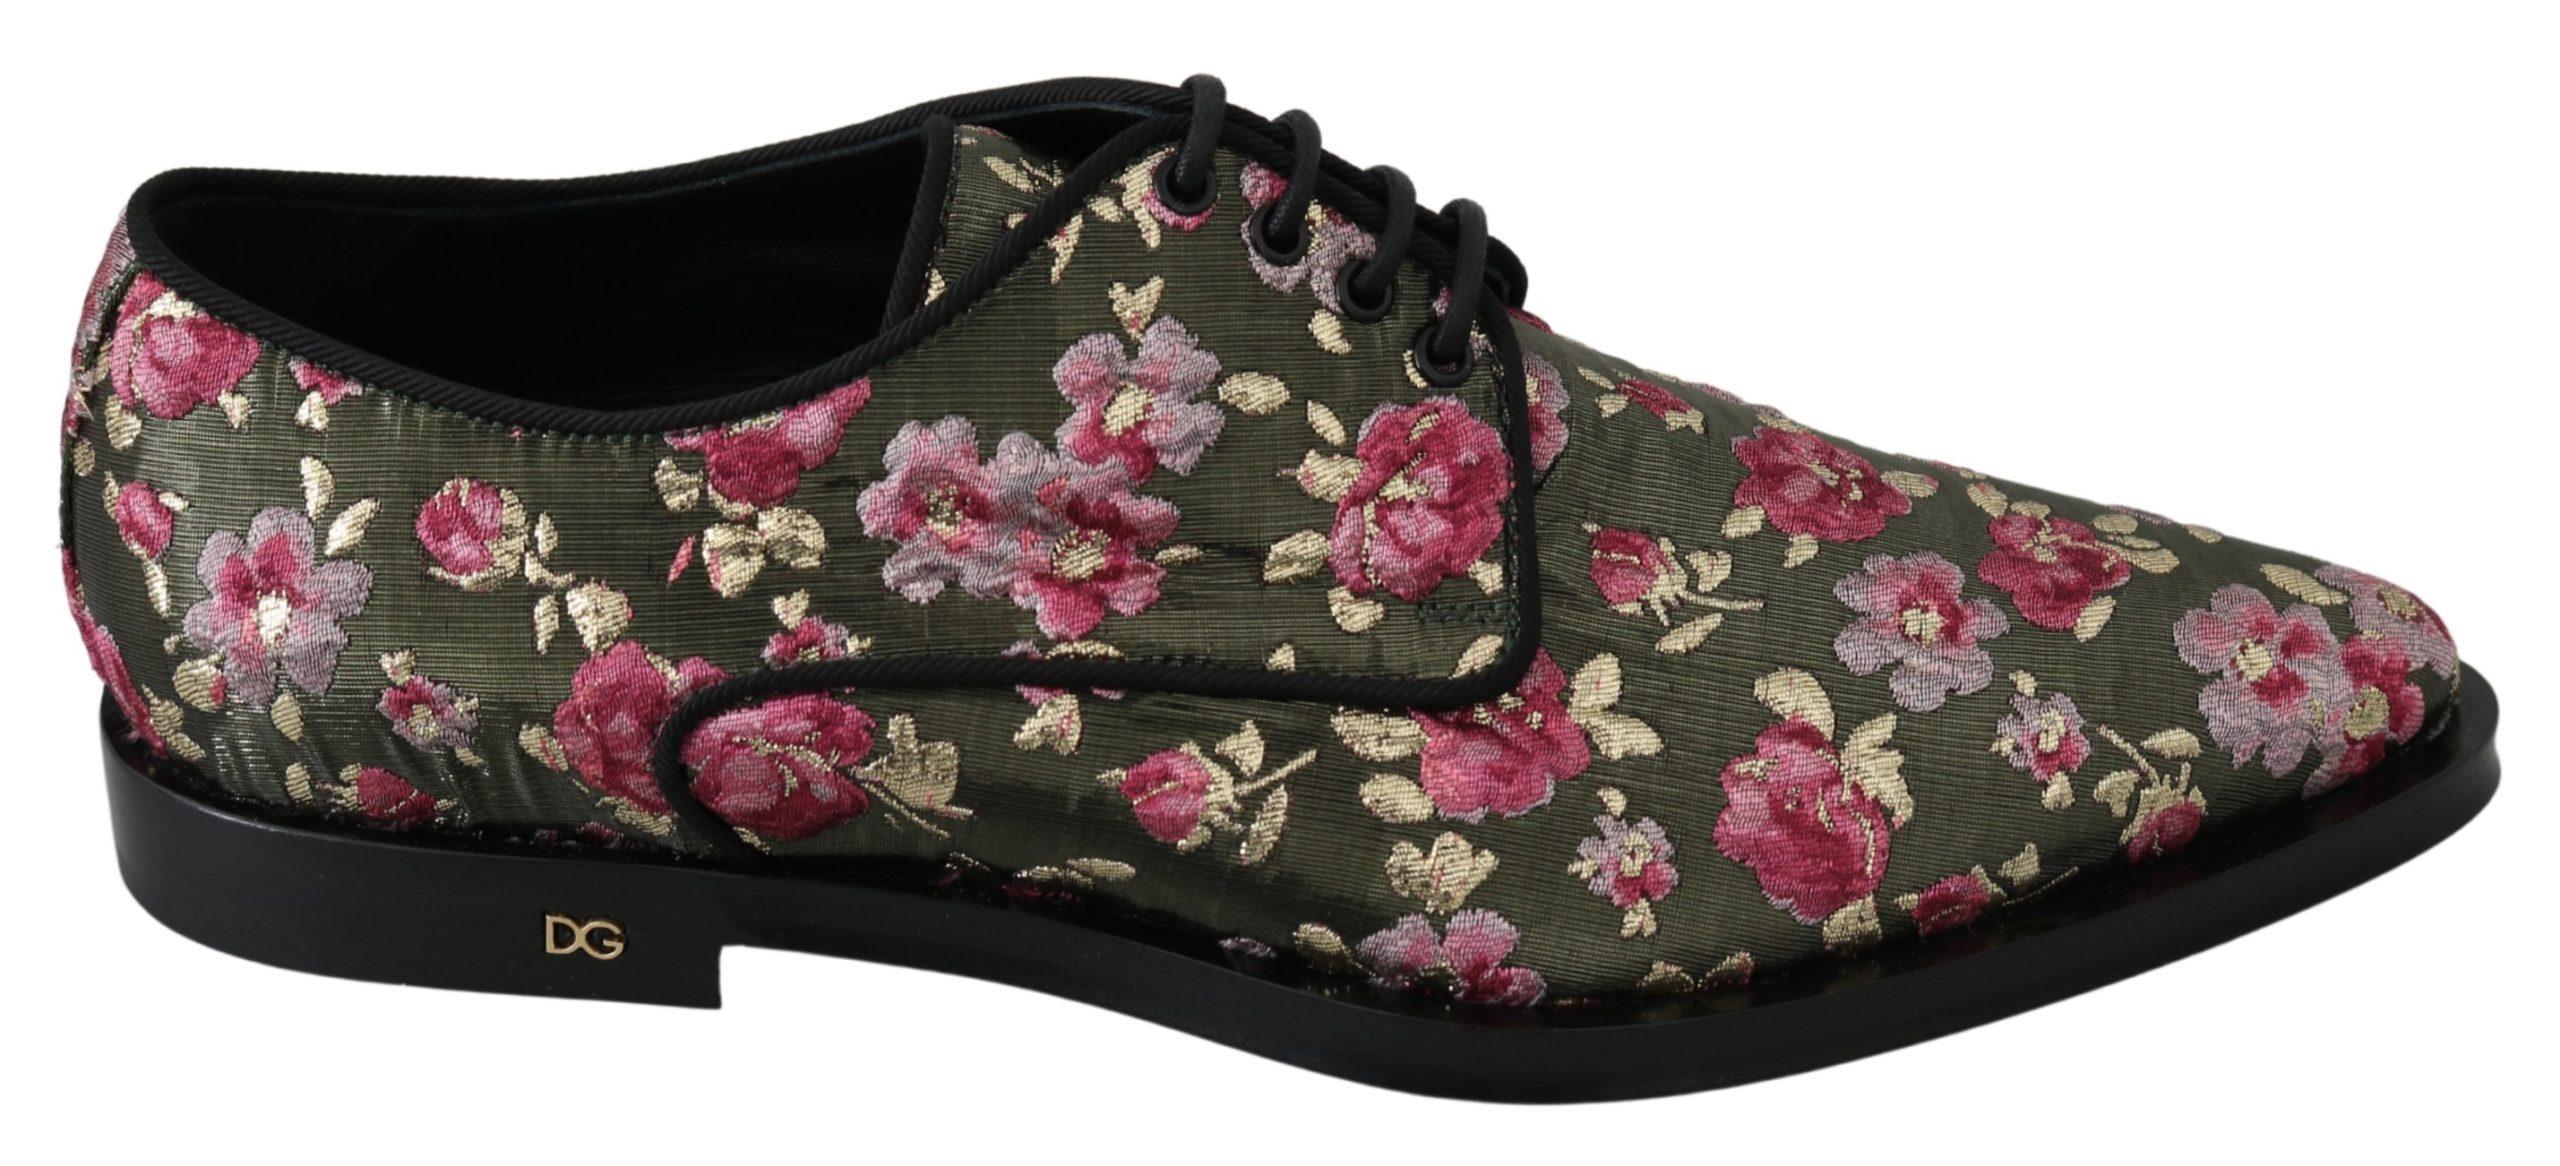 Dolce & Gabbana Women's Jacquard Floral Dress Broque Shoe Green LA7213 - EU39/US8.5